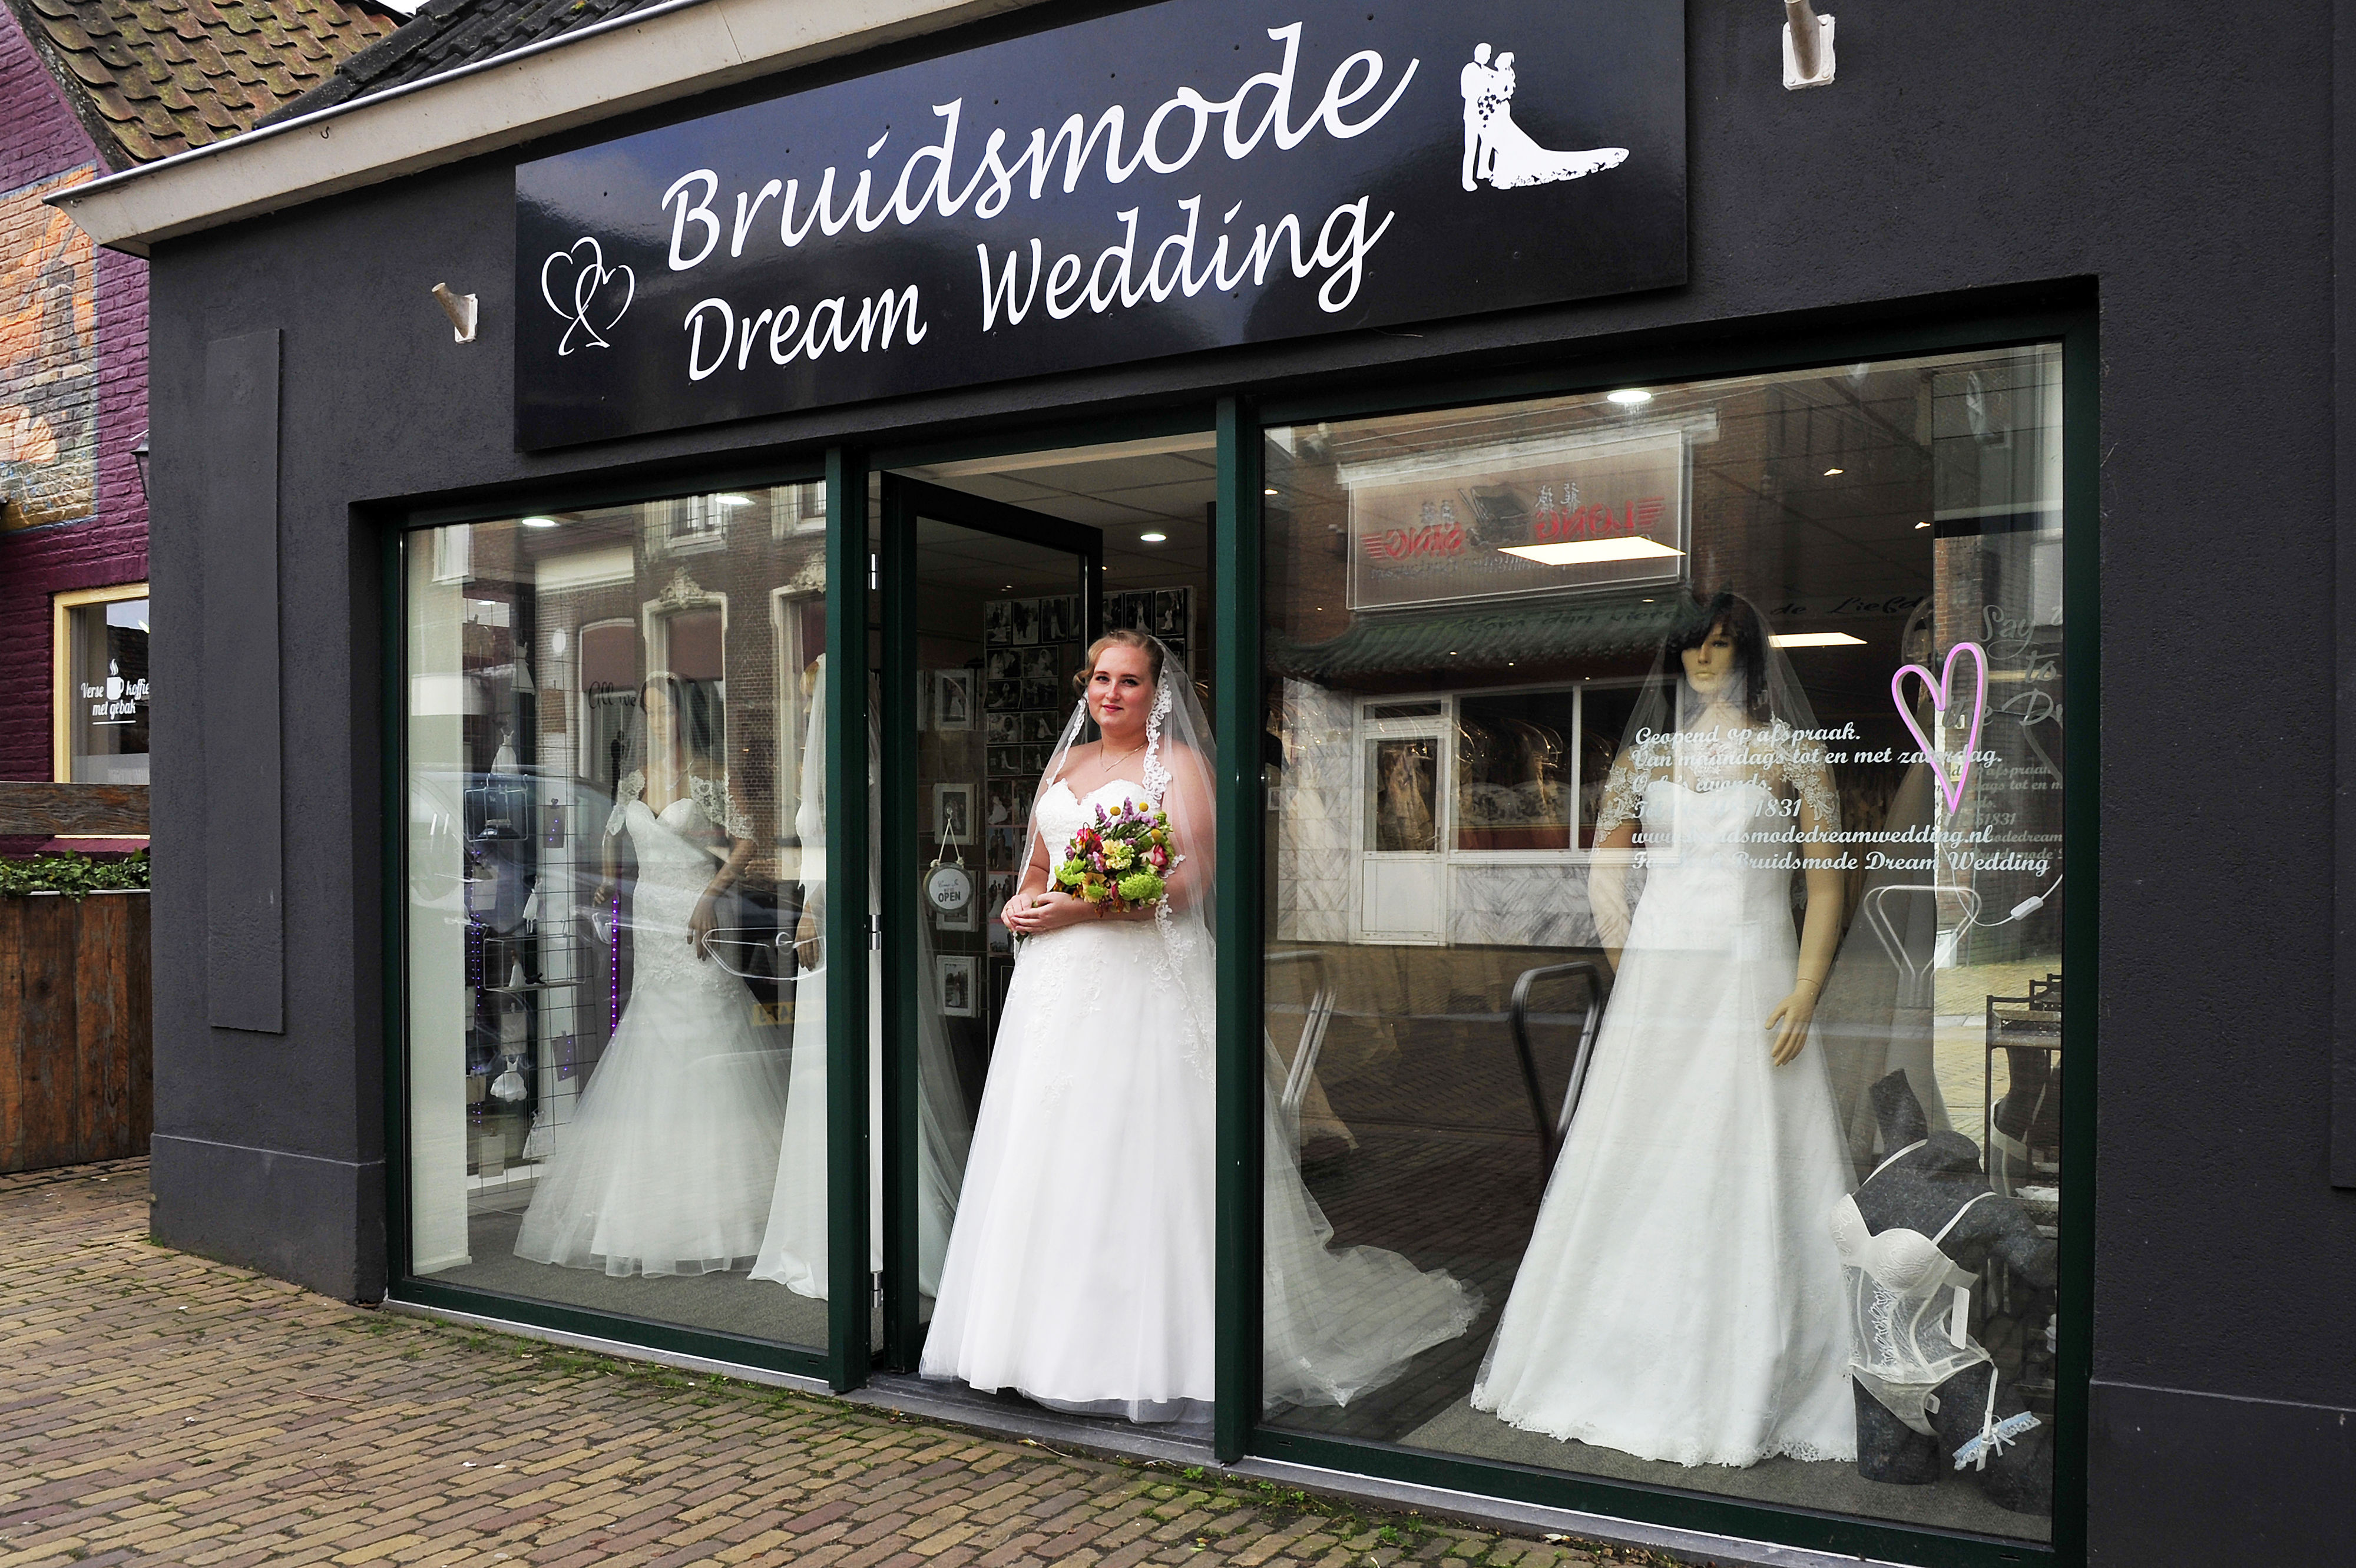 Bruidsmode Dream Wedding